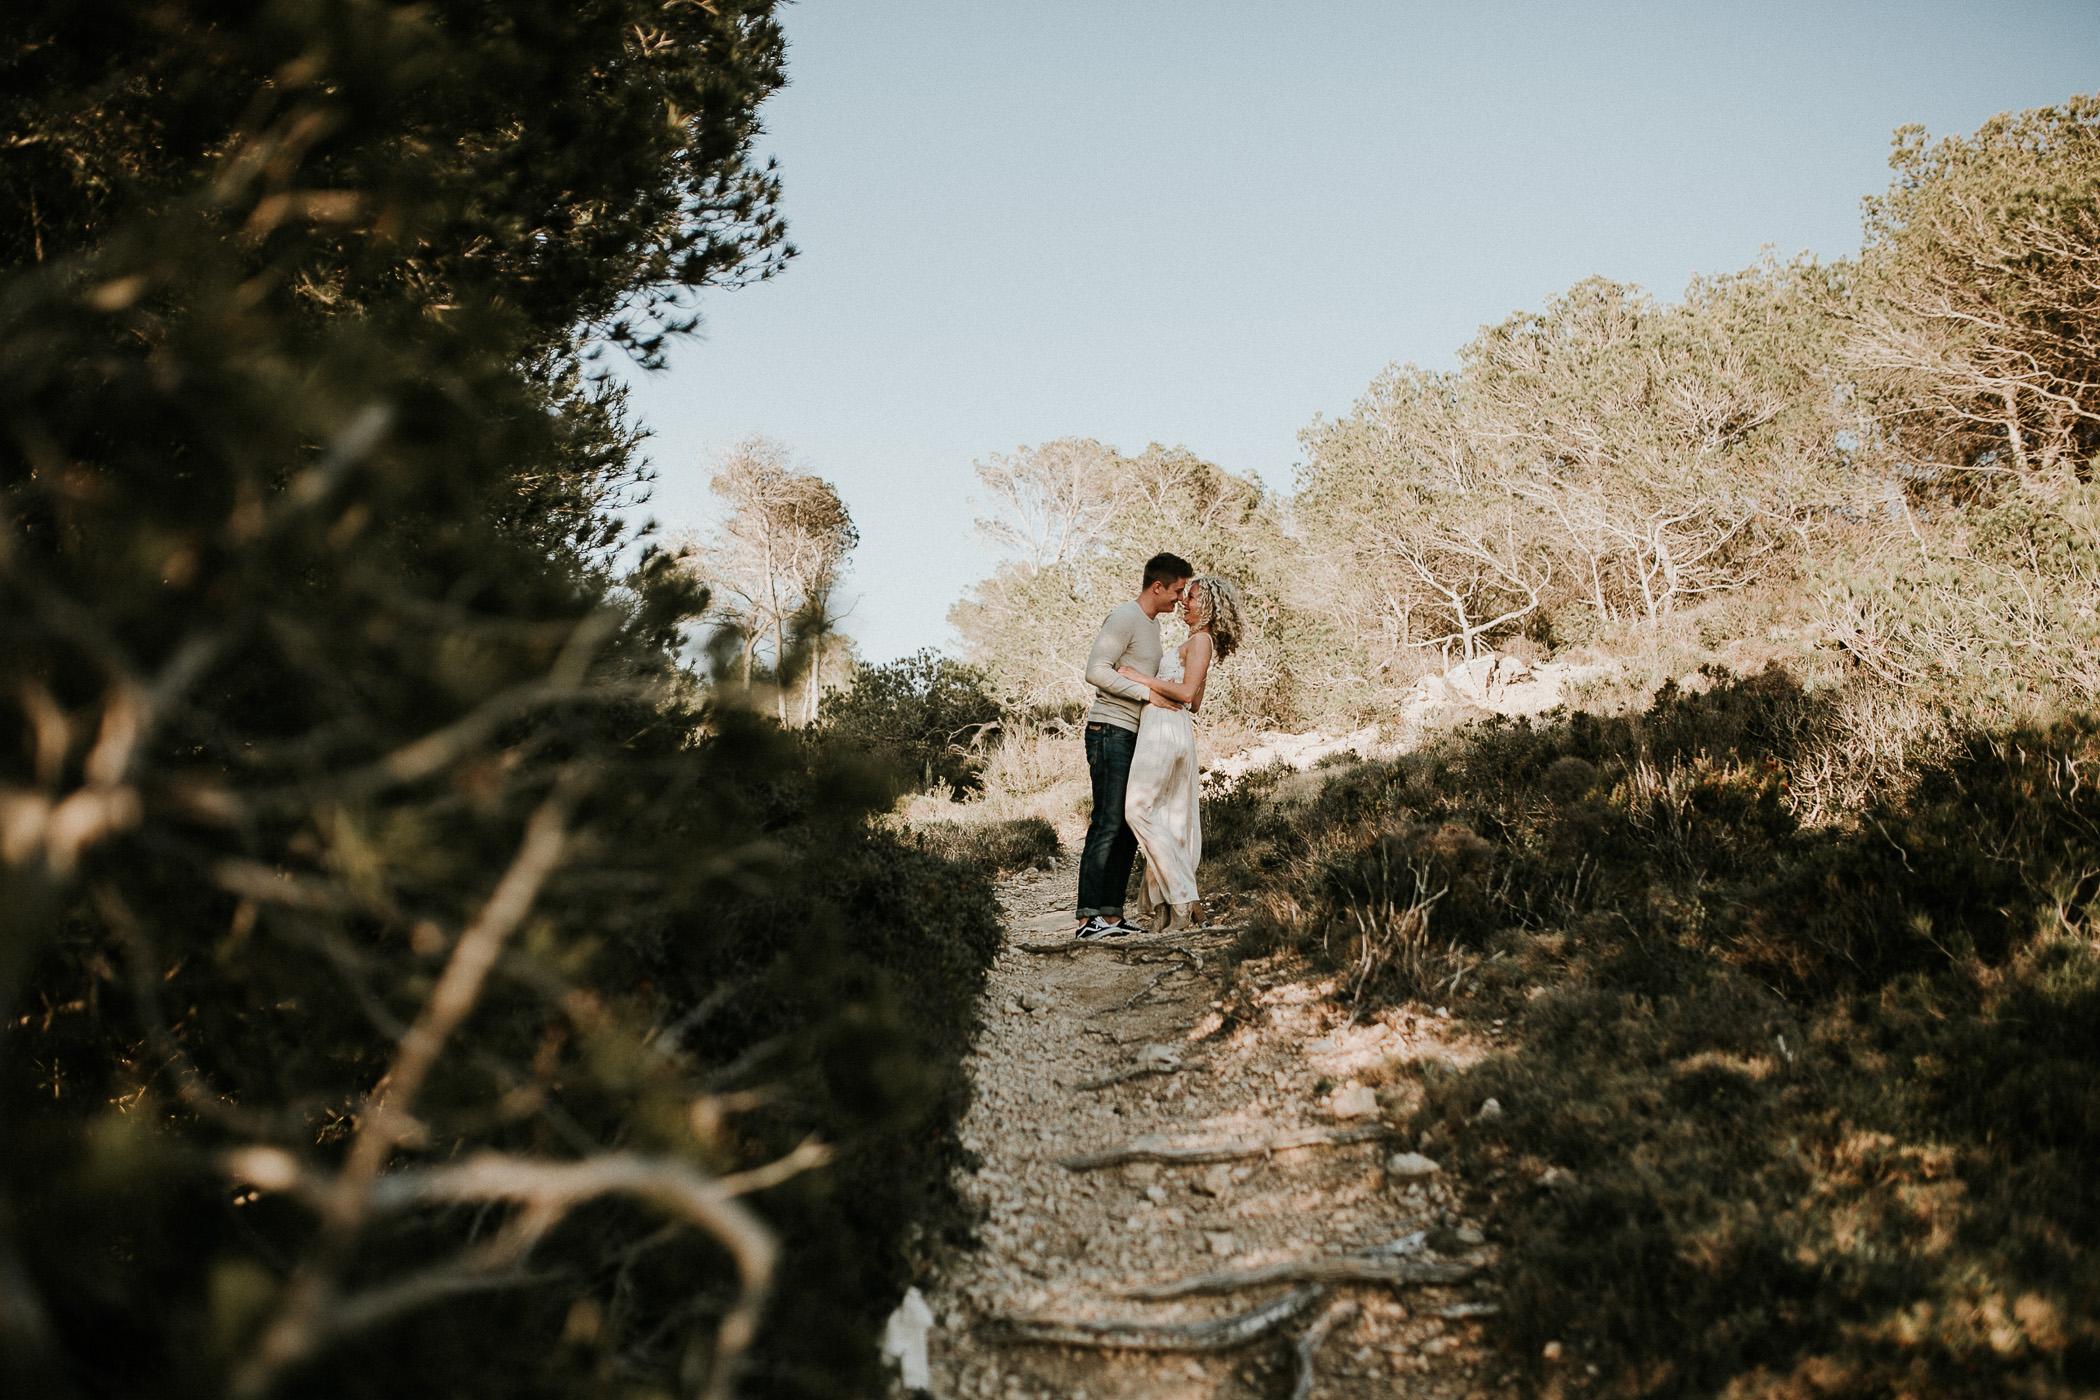 DanielaMarquardtPhotography_elopement_mallorca_spain_paguera_palma_charlyandbela_56